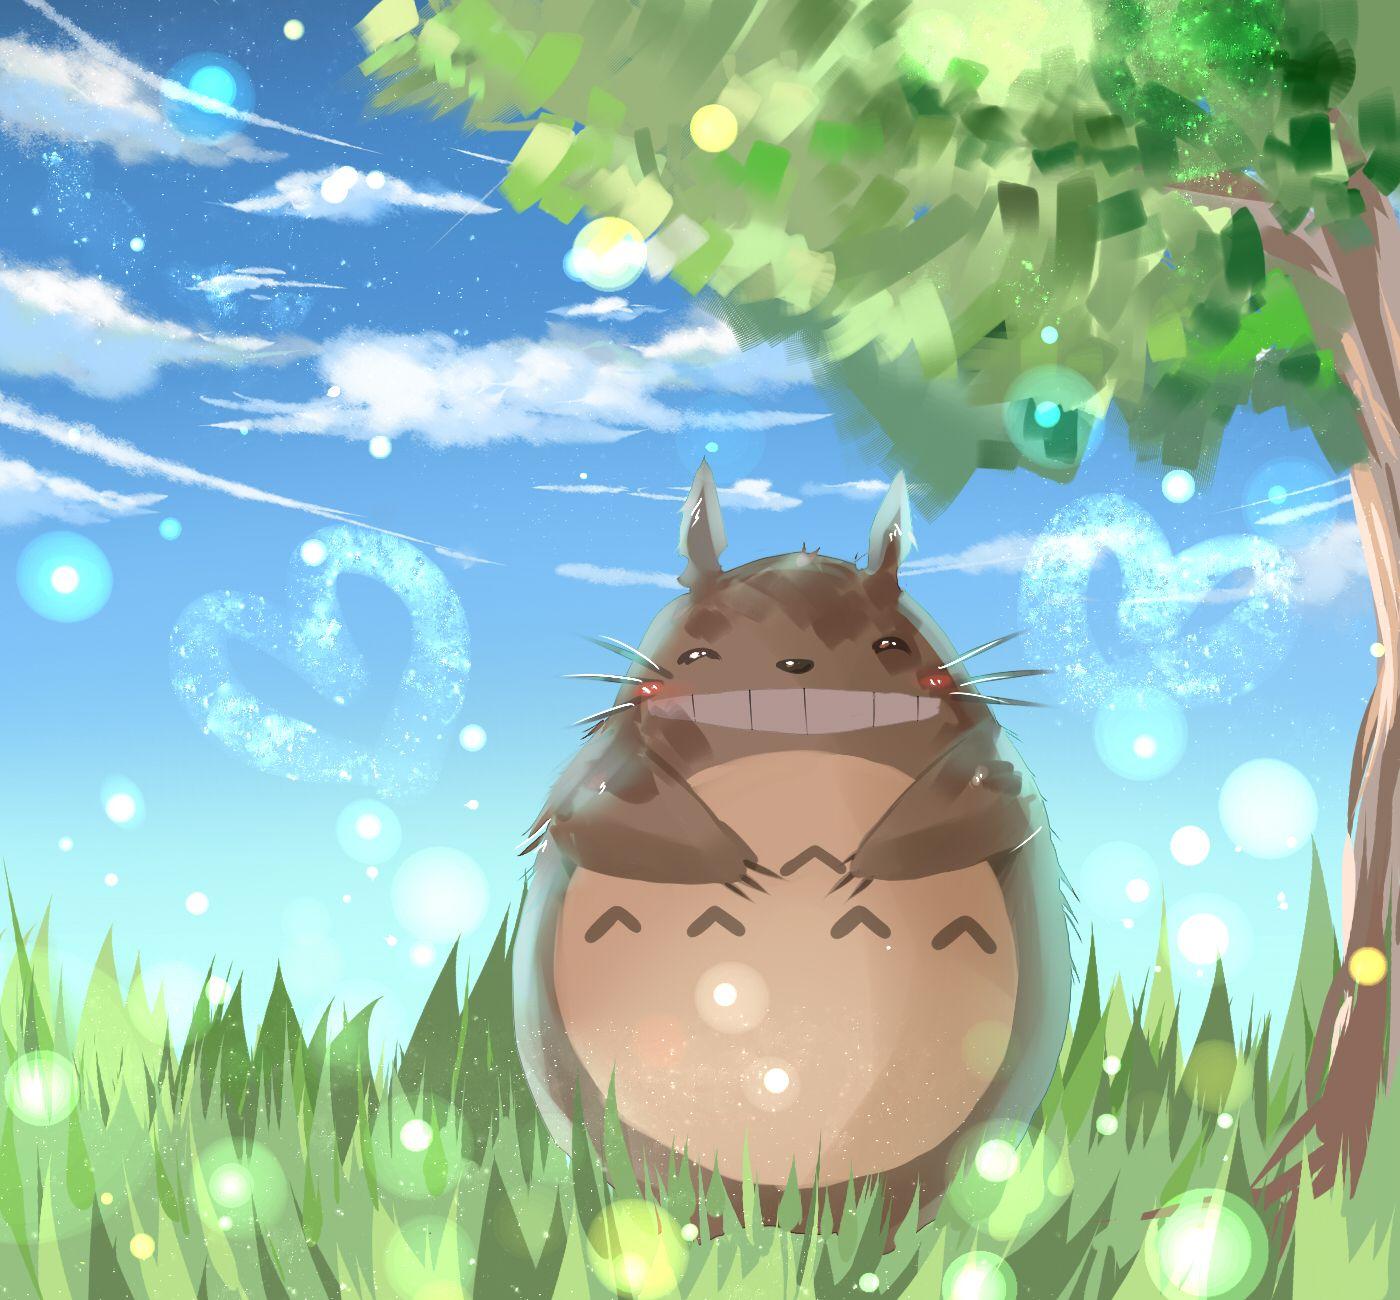 Pin by ducksforlife on Totoro Totoro, Anime, My